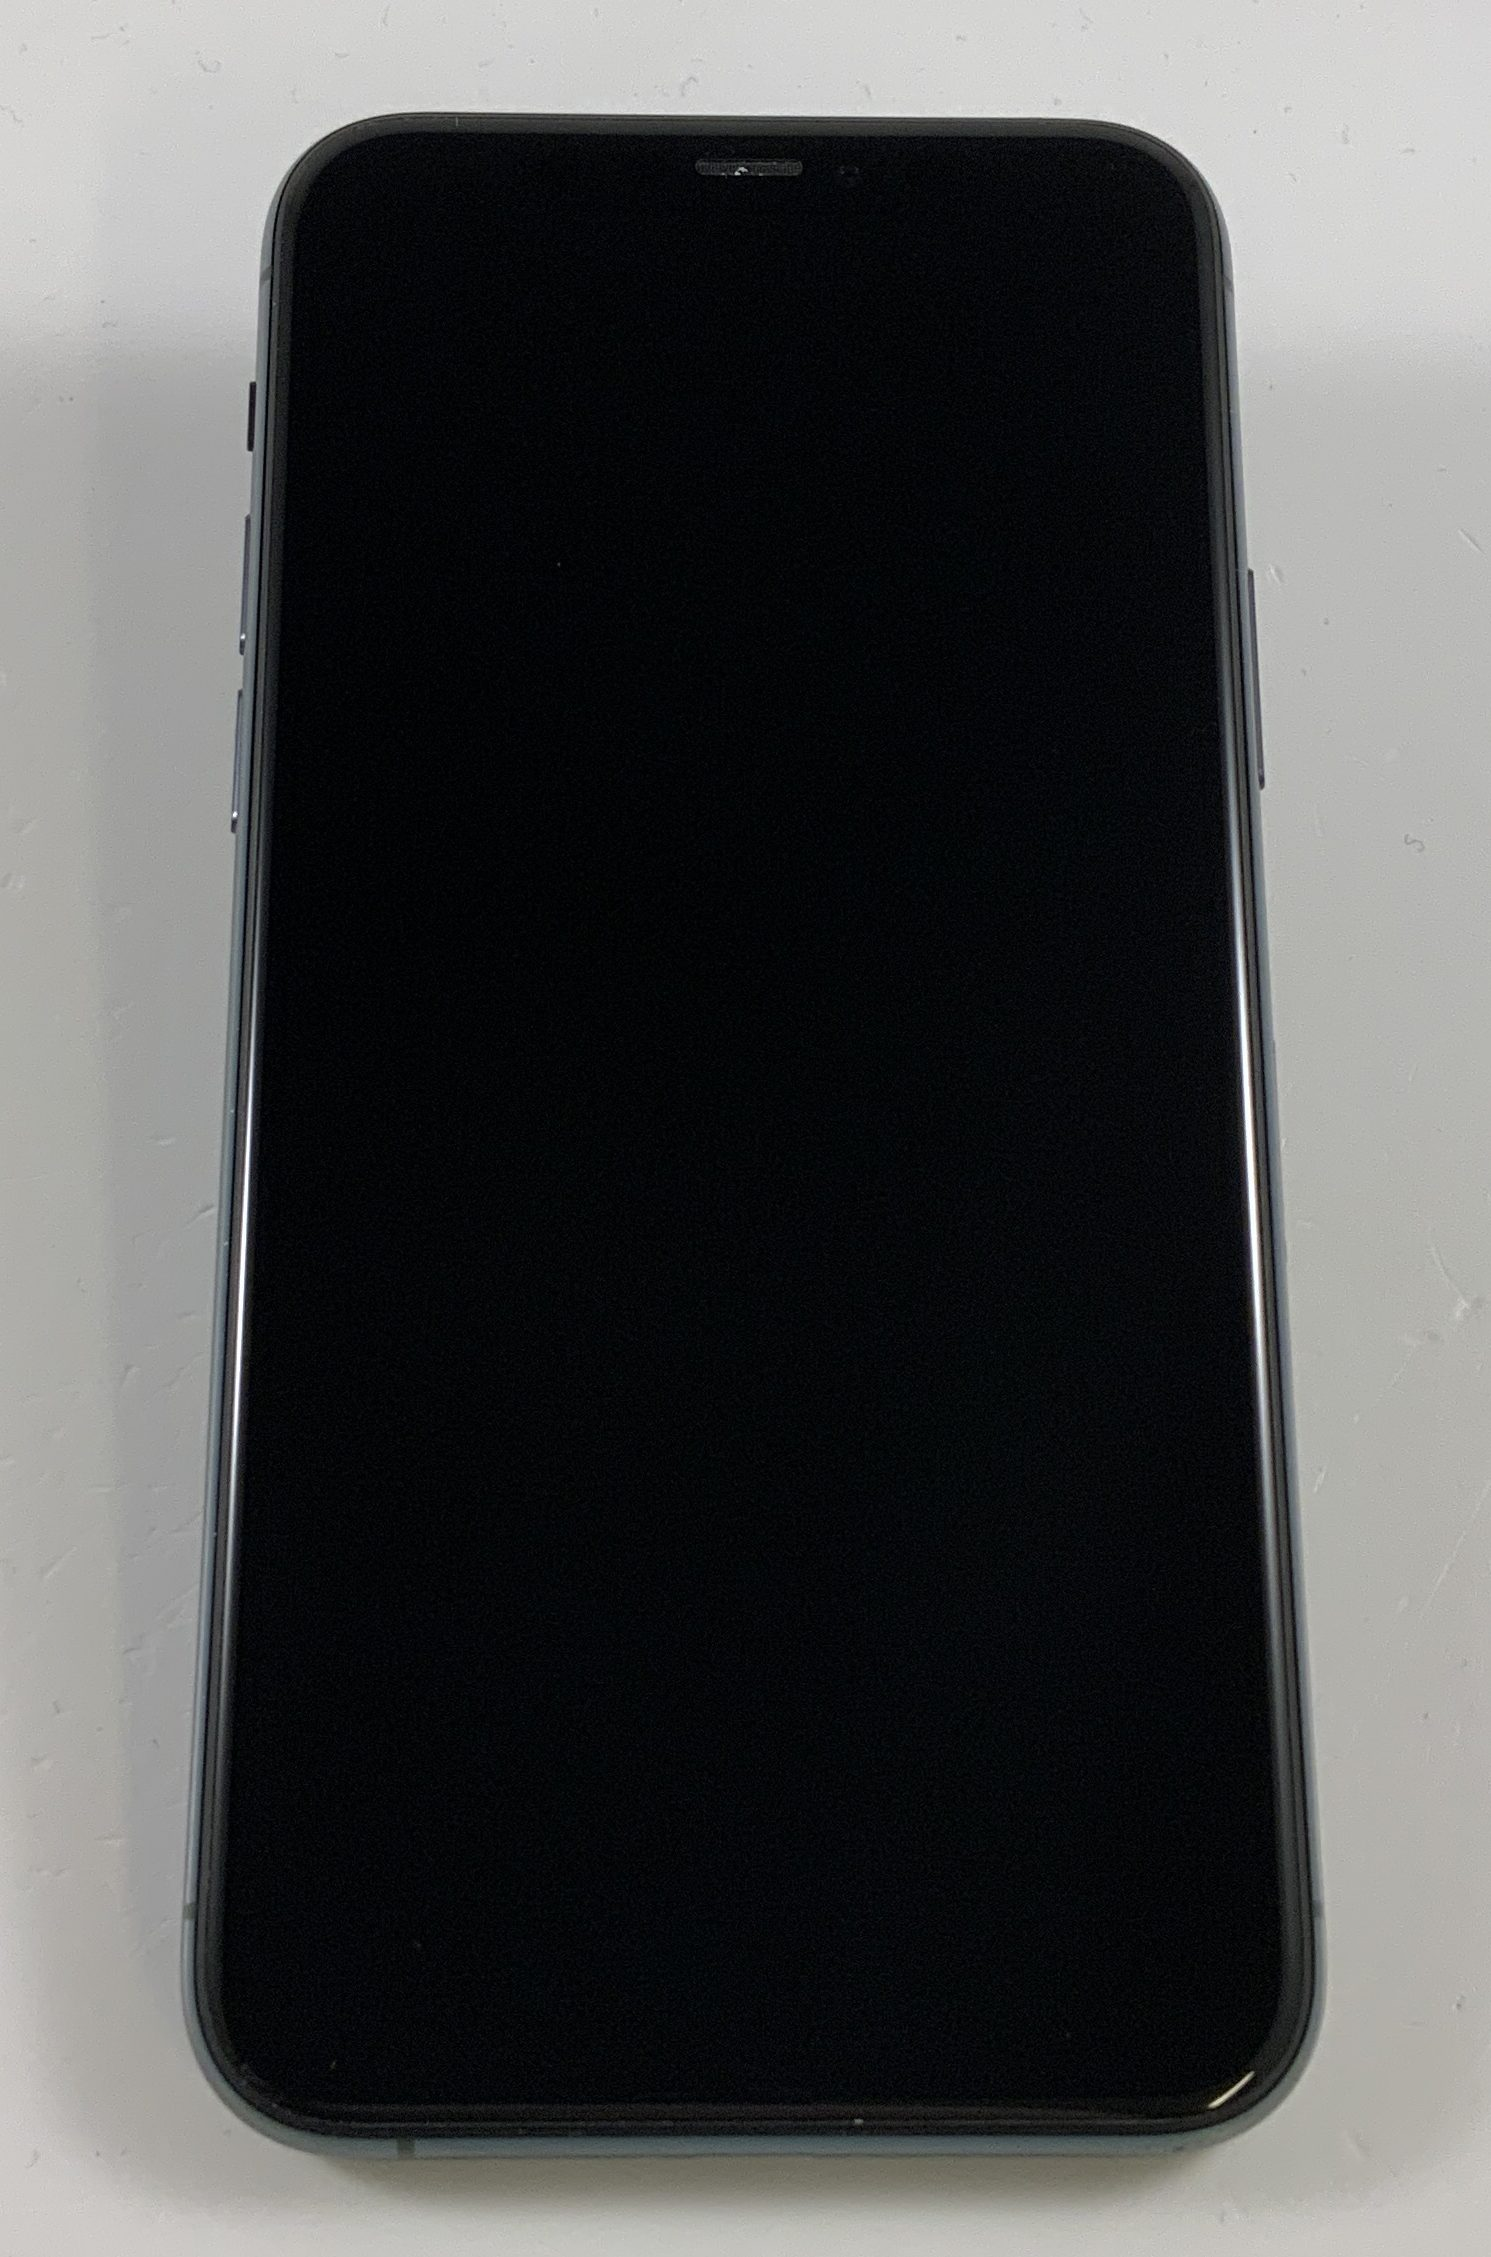 iPhone 11 Pro 64GB, 64GB, Midnight Green, image 1